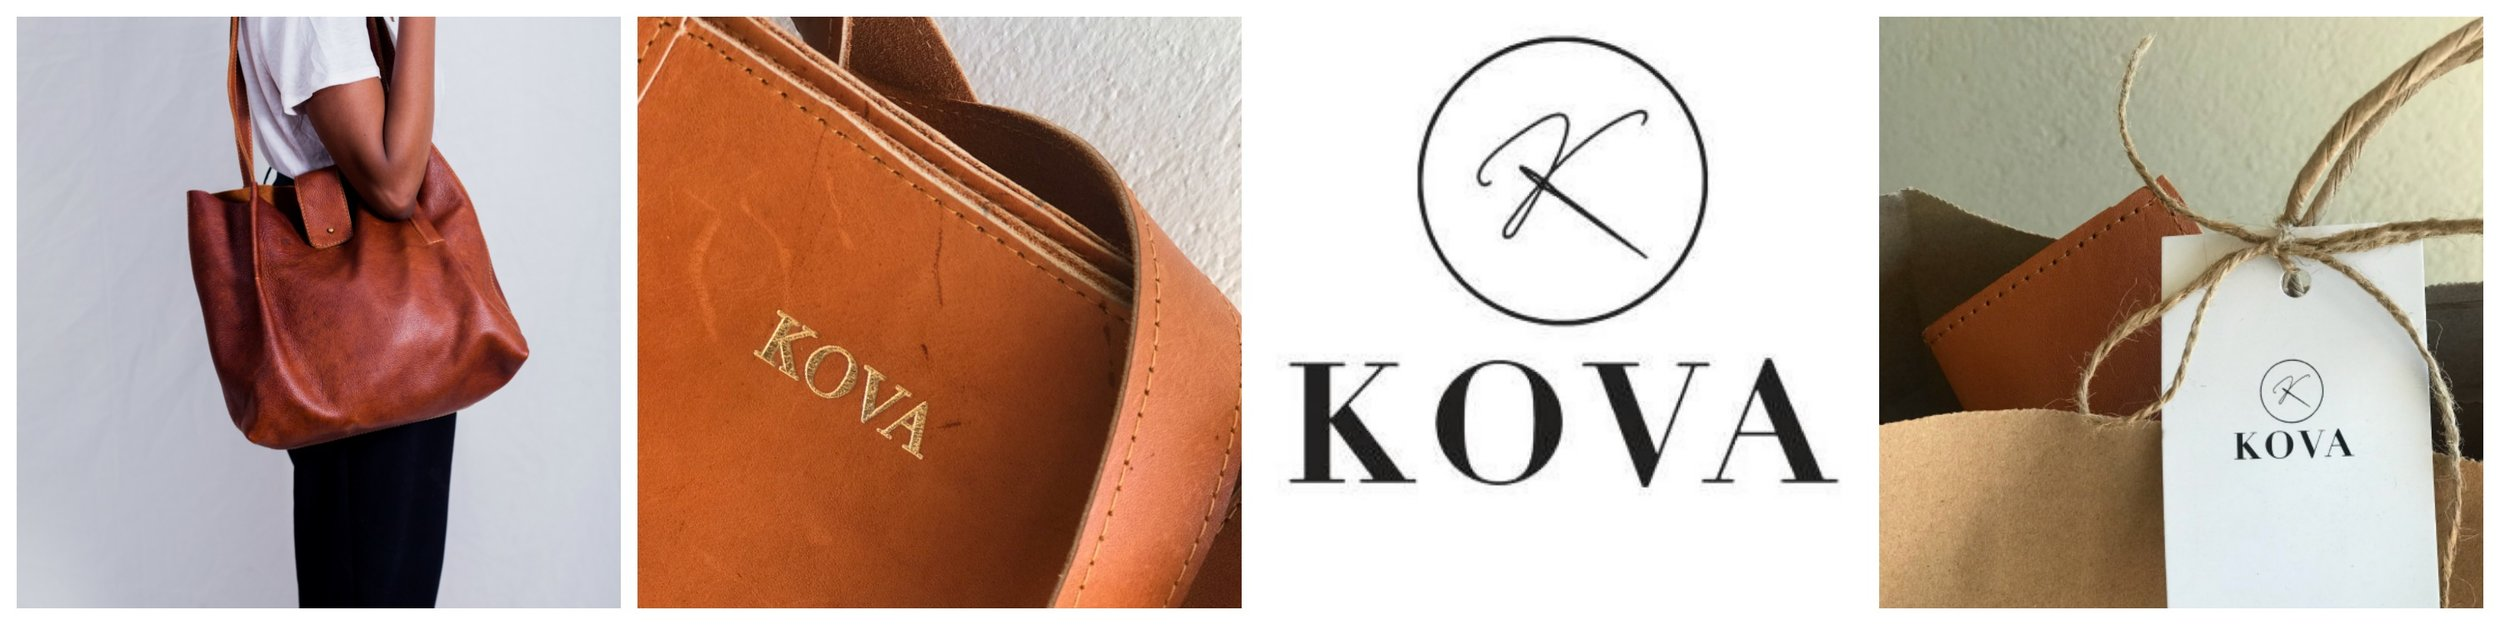 Kova-Collage-3.jpg